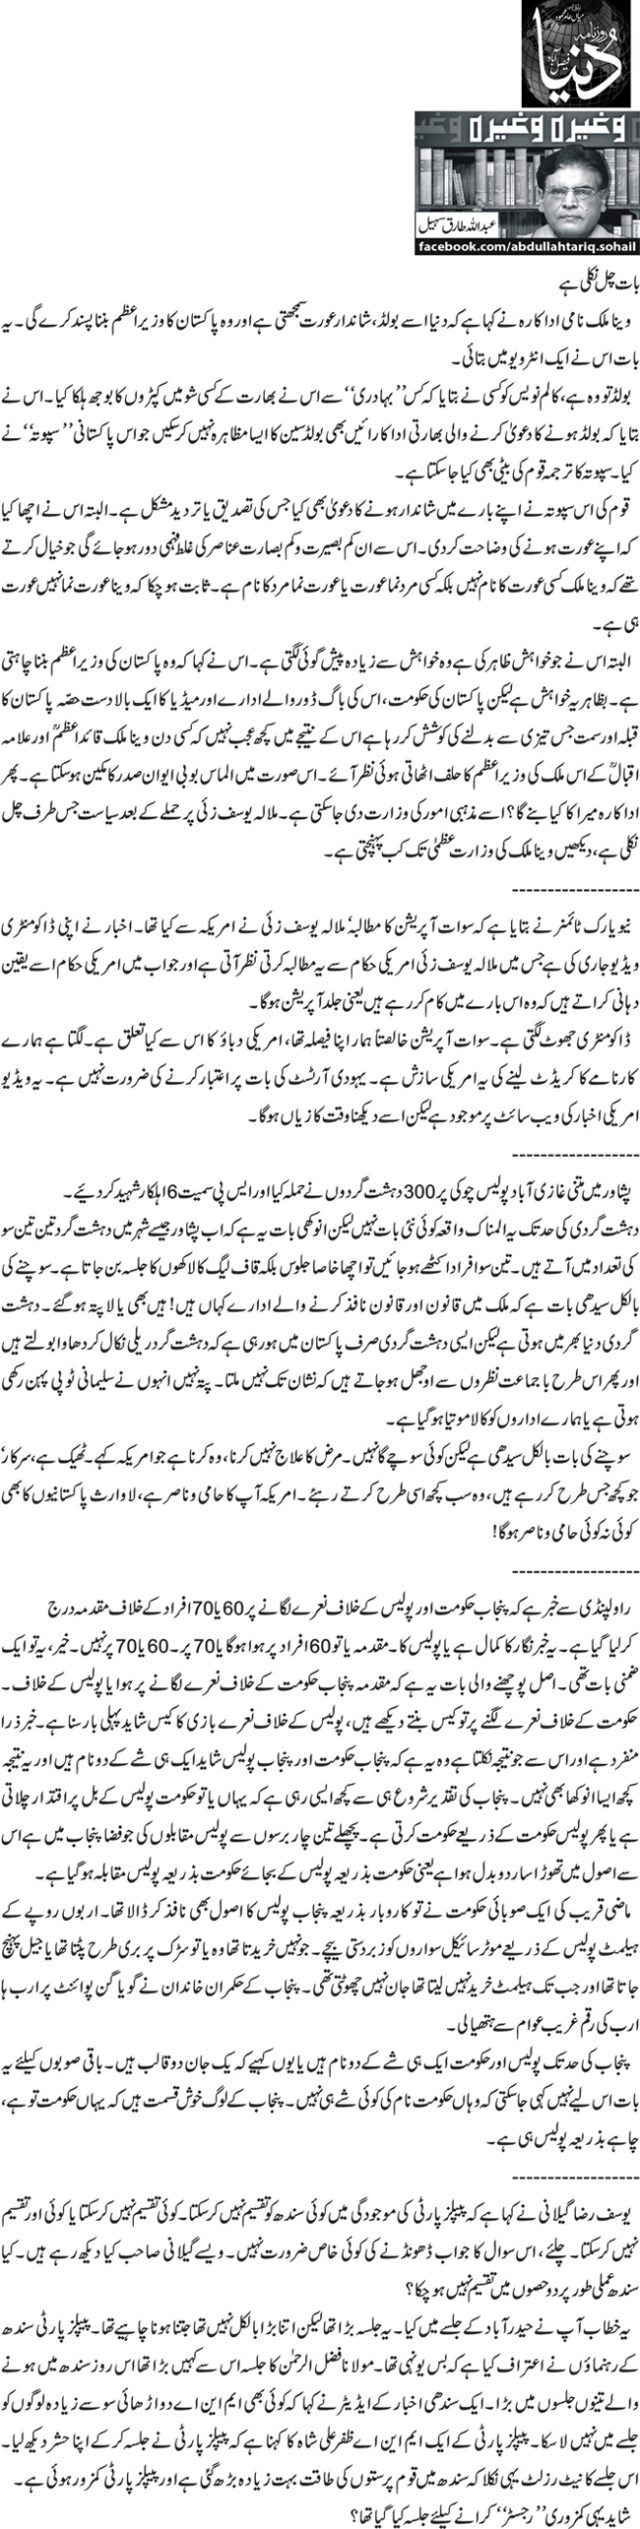 Baat chal nikli ha - Abdullah Tariq Sohail